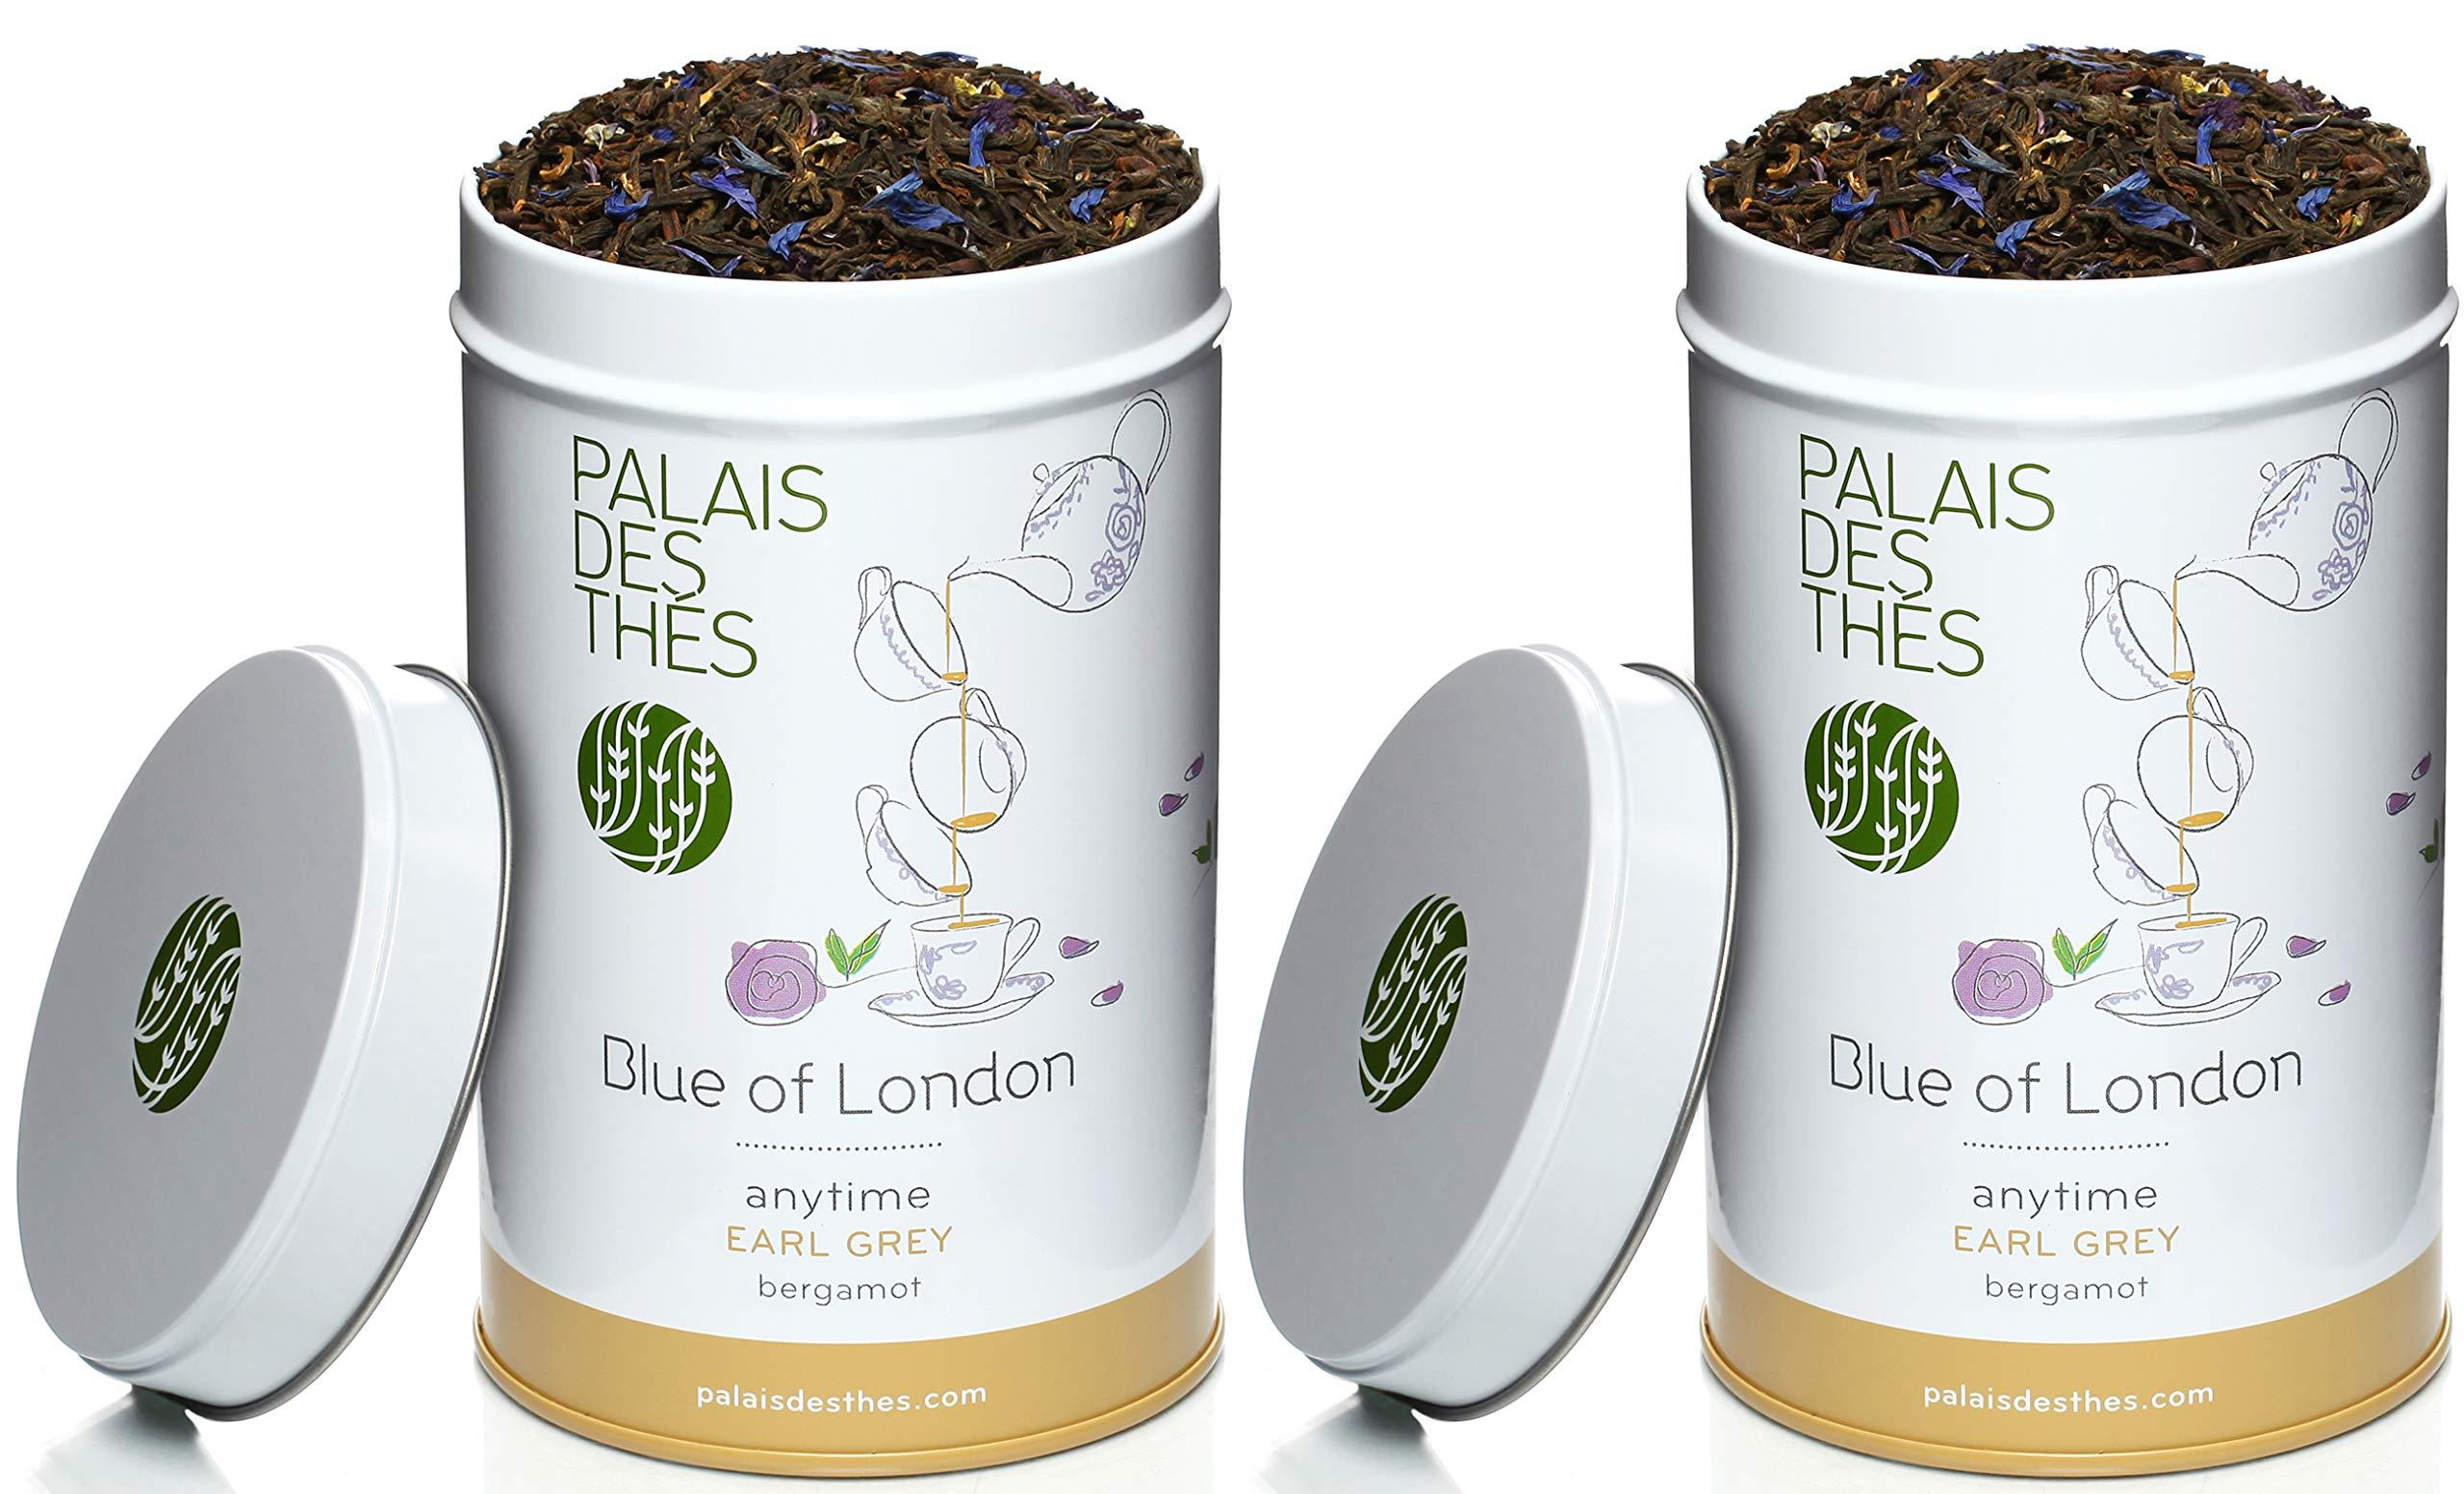 Palais des Thés Blue of London Earl Grey Tea, 3.5oz Metal Tin (2 Pack)